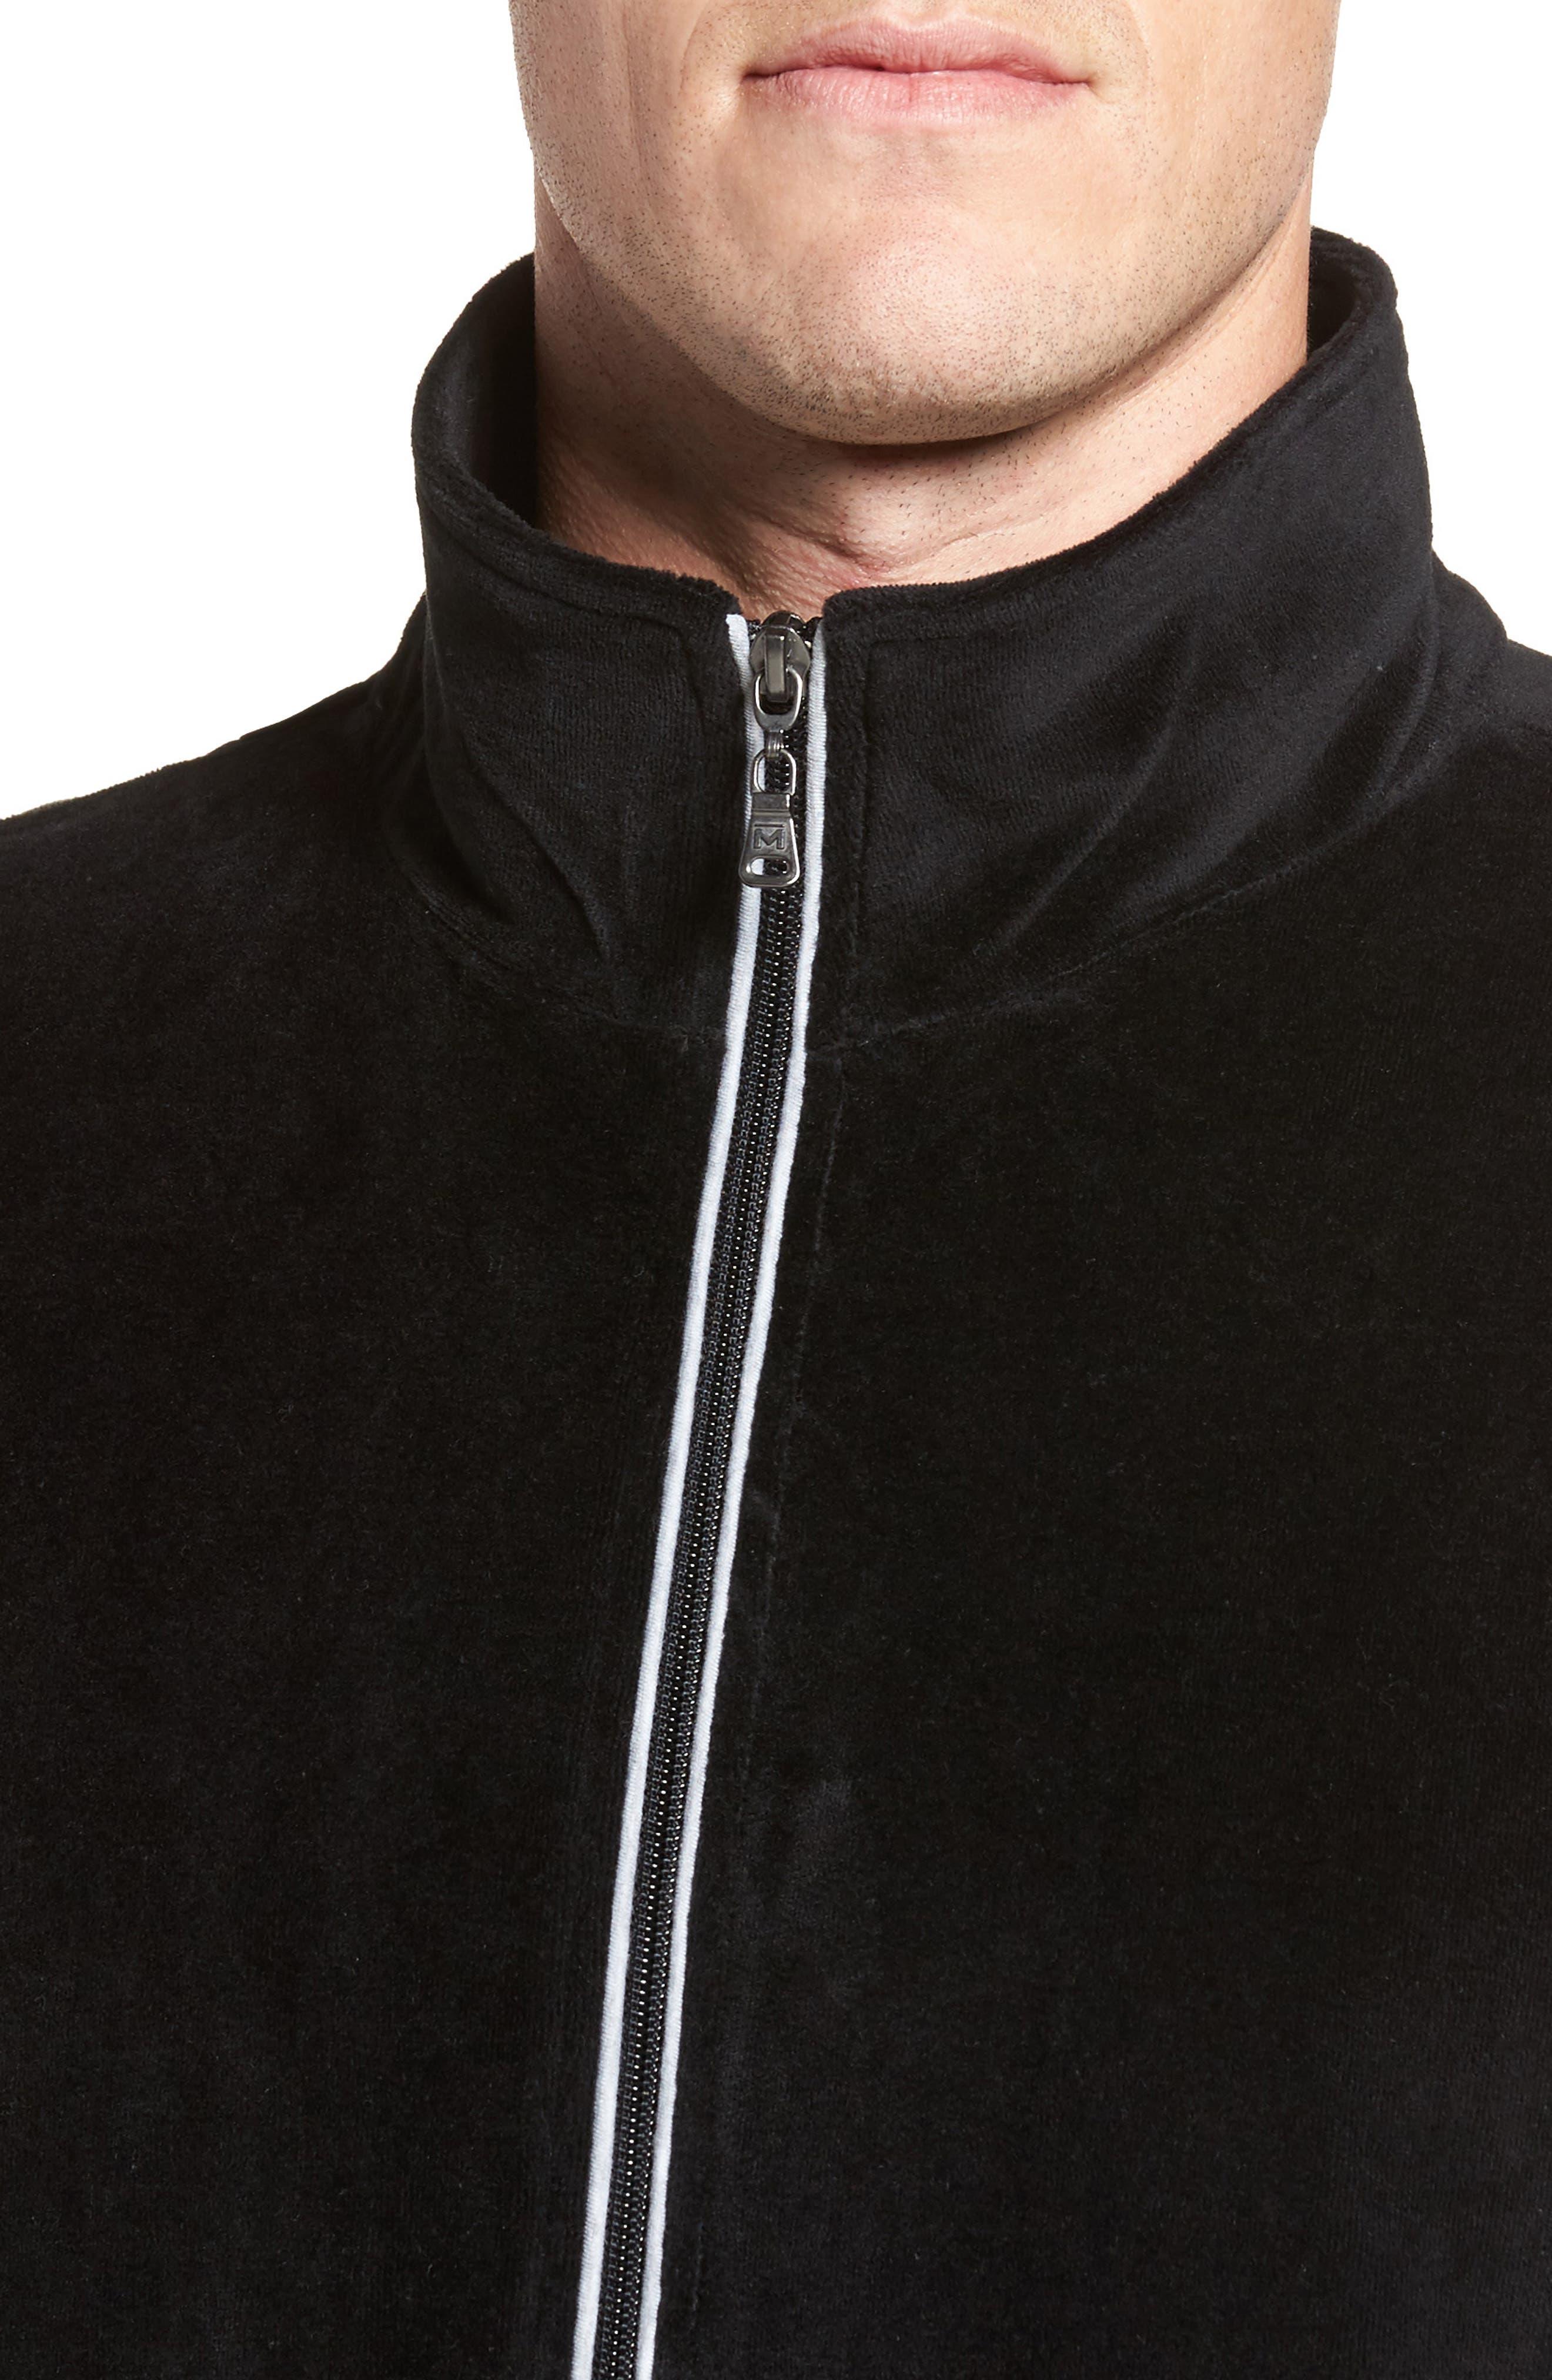 Strathcona Velour Warm-Up Suit,                             Alternate thumbnail 4, color,                             001